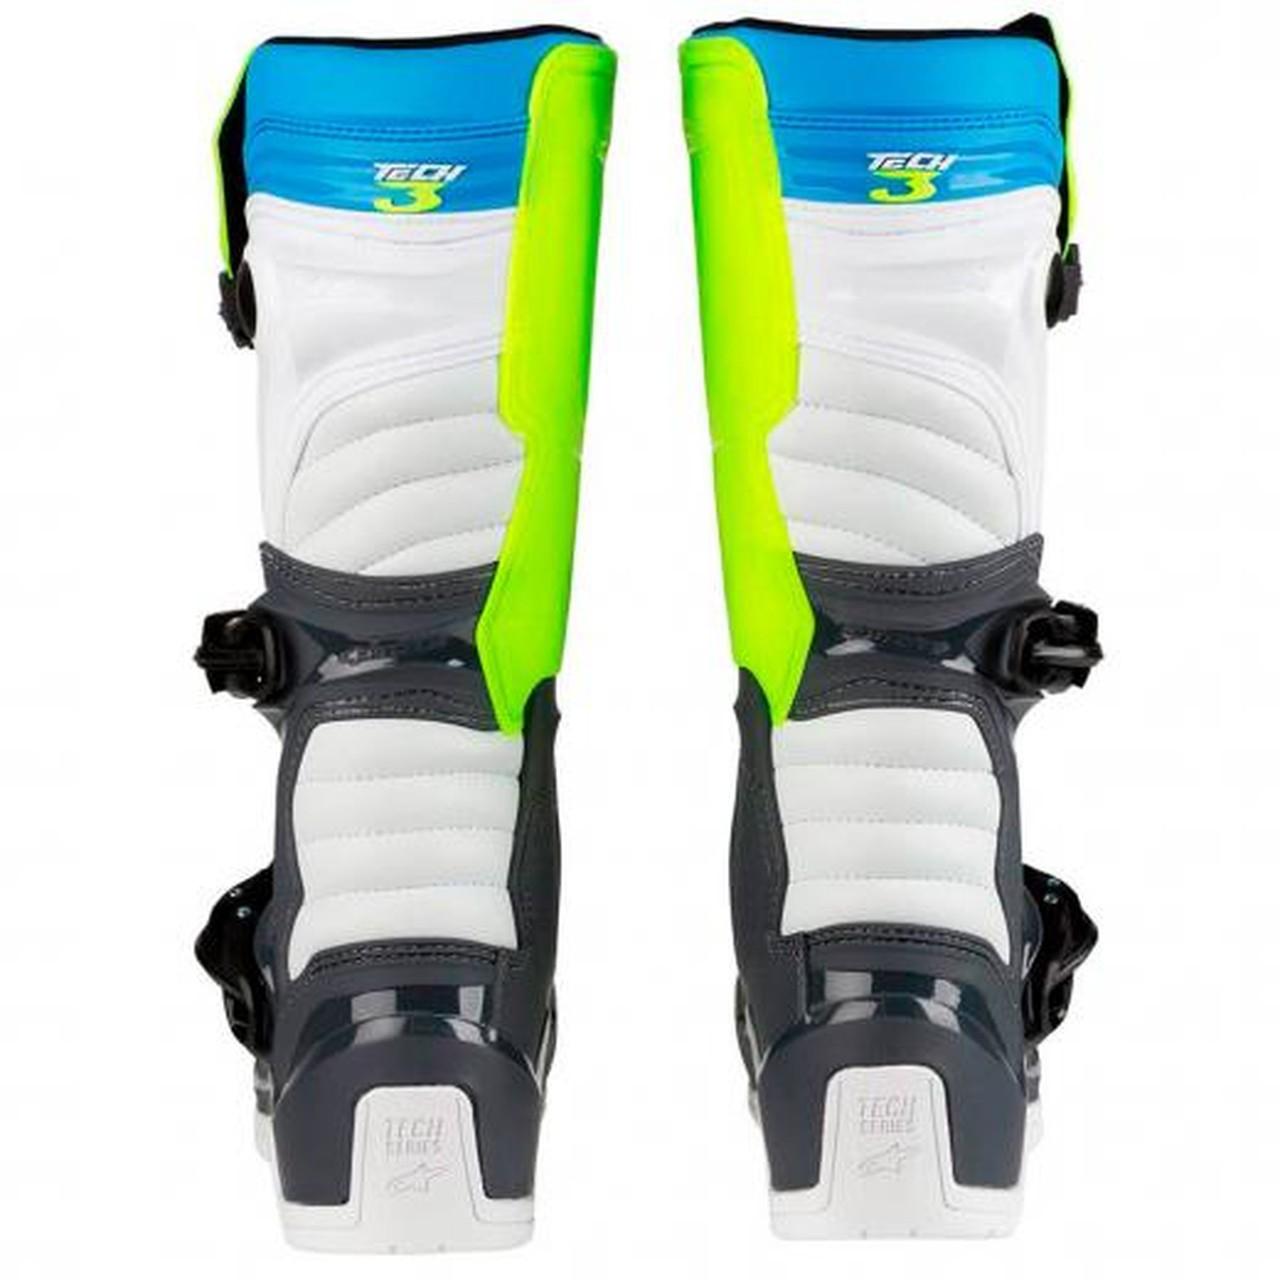 Bota Alpinestars Tech 3 - Azul/Amarelo